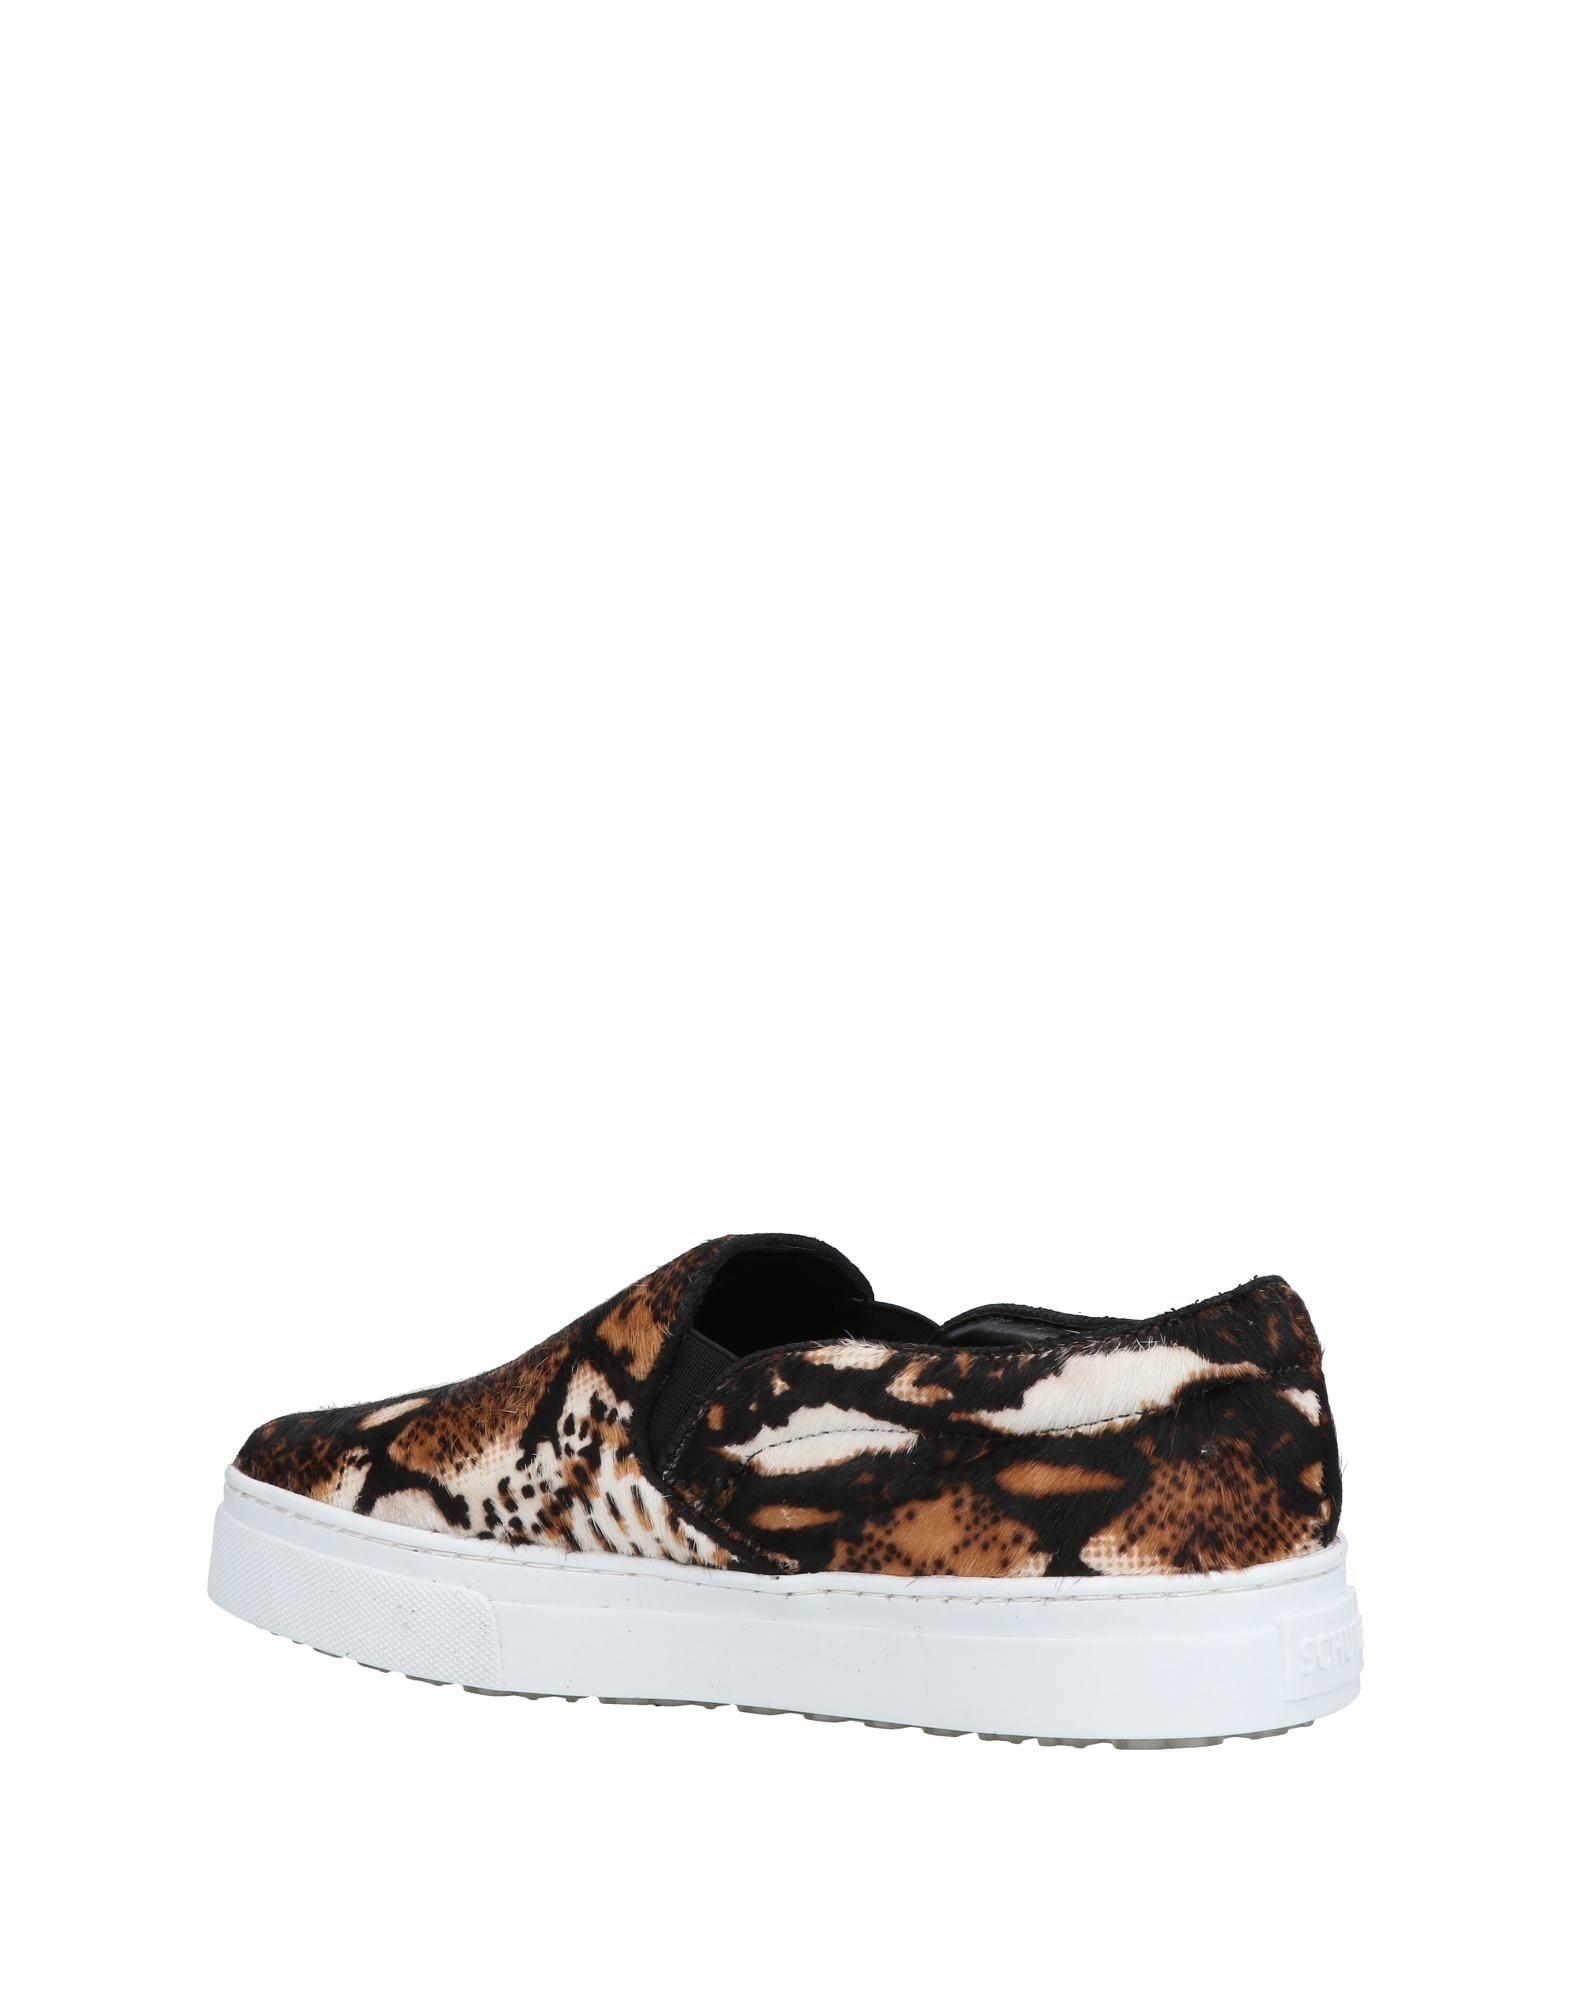 Schutz Sneakers Damen beliebte  11480503DT Gute Qualität beliebte Damen Schuhe 419ff6